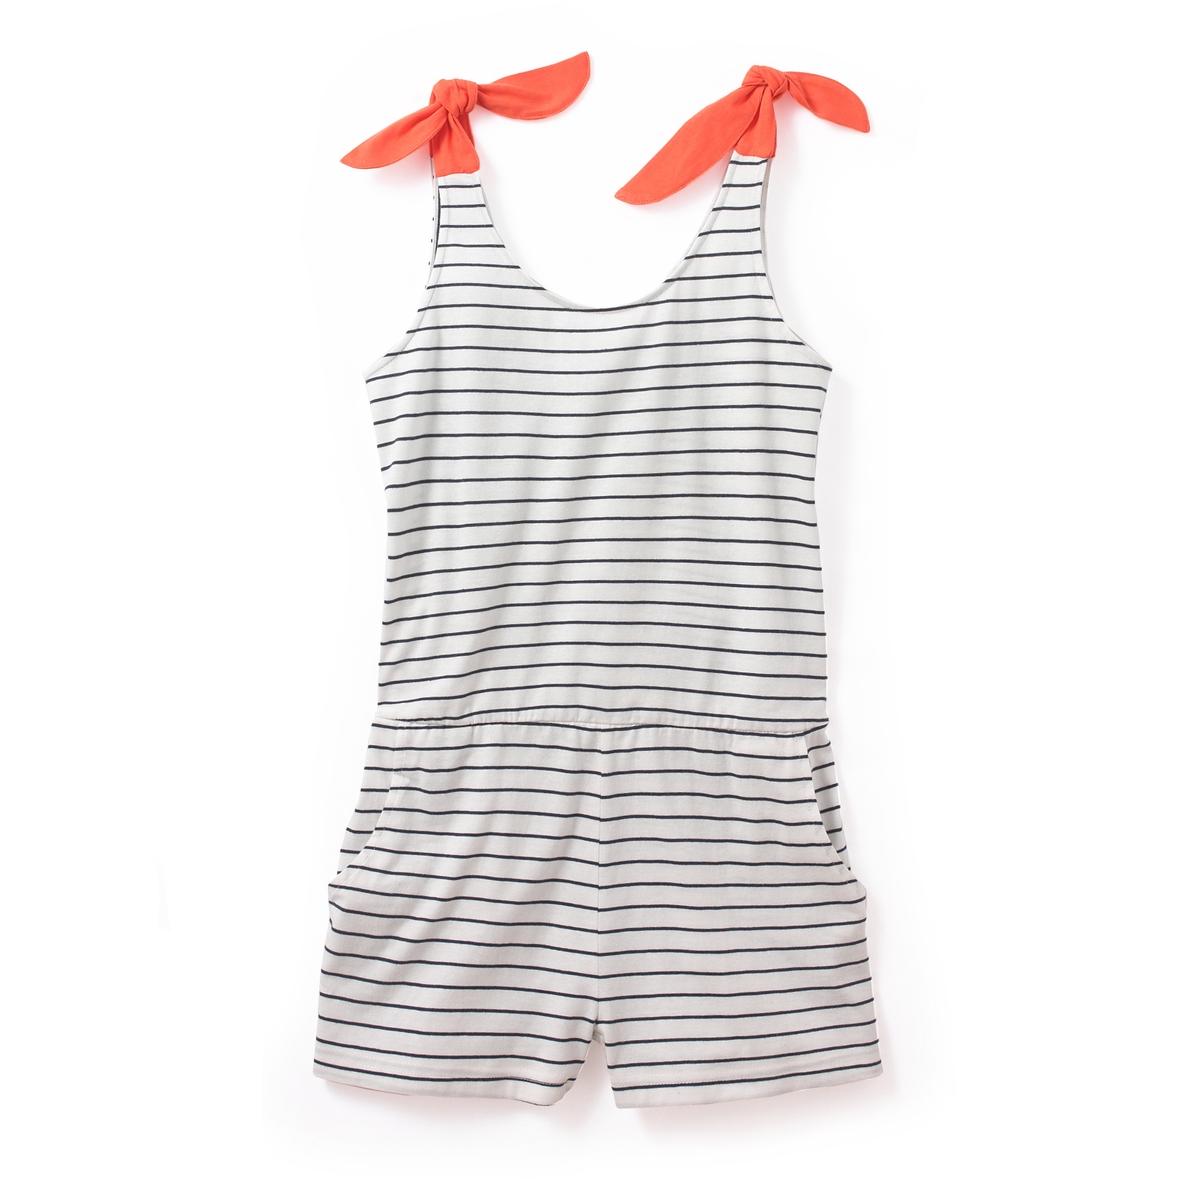 Пижама-комбинезон с шортами из трикотажа 10-16 лет